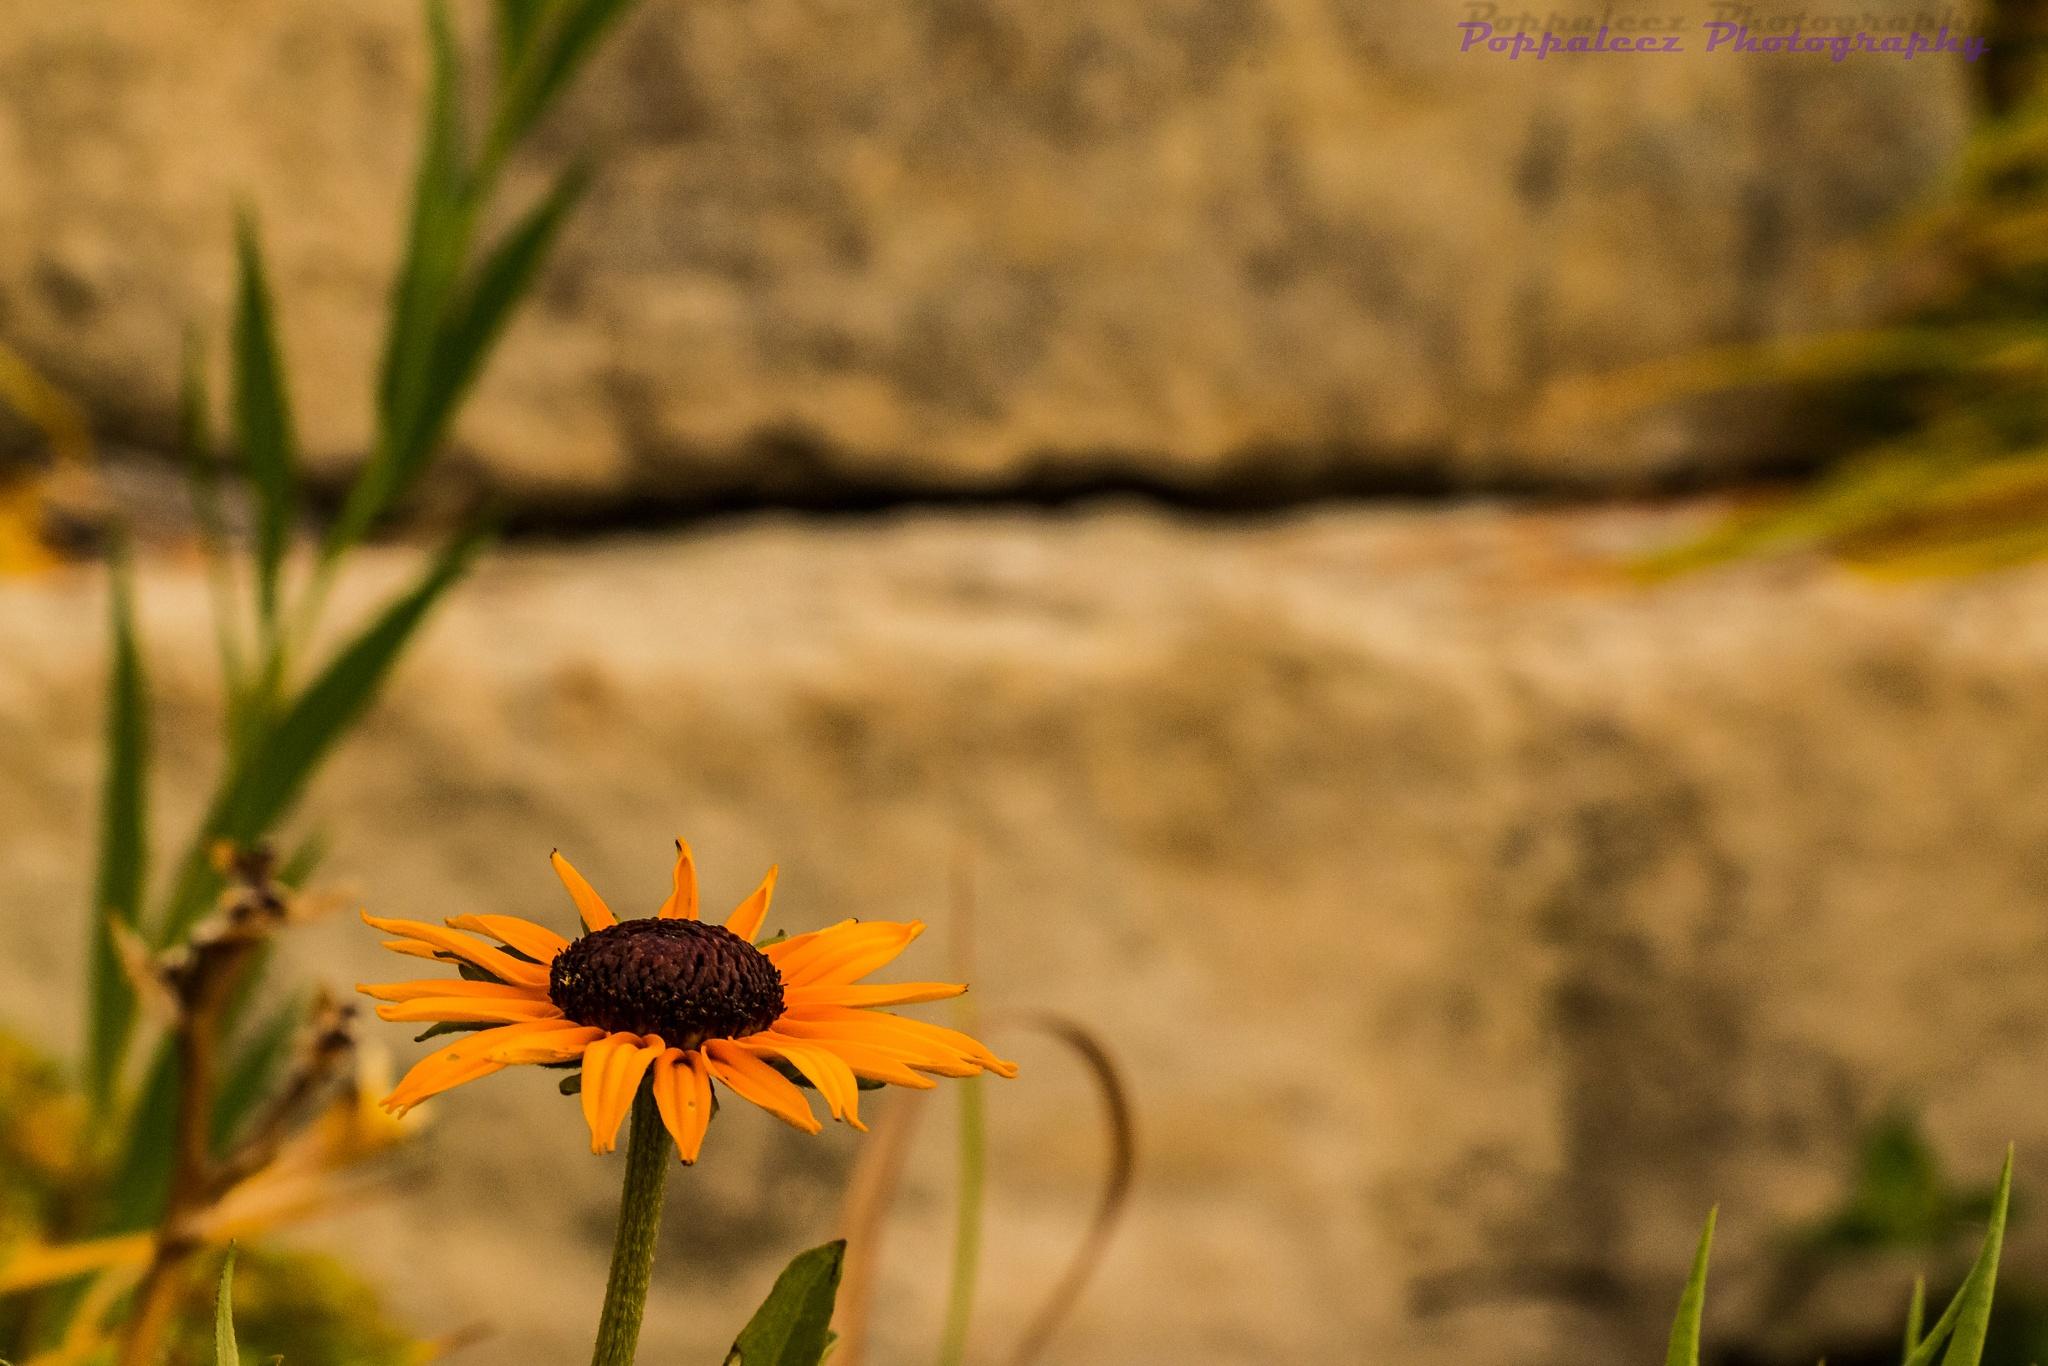 sunny side up by midwestphotobug